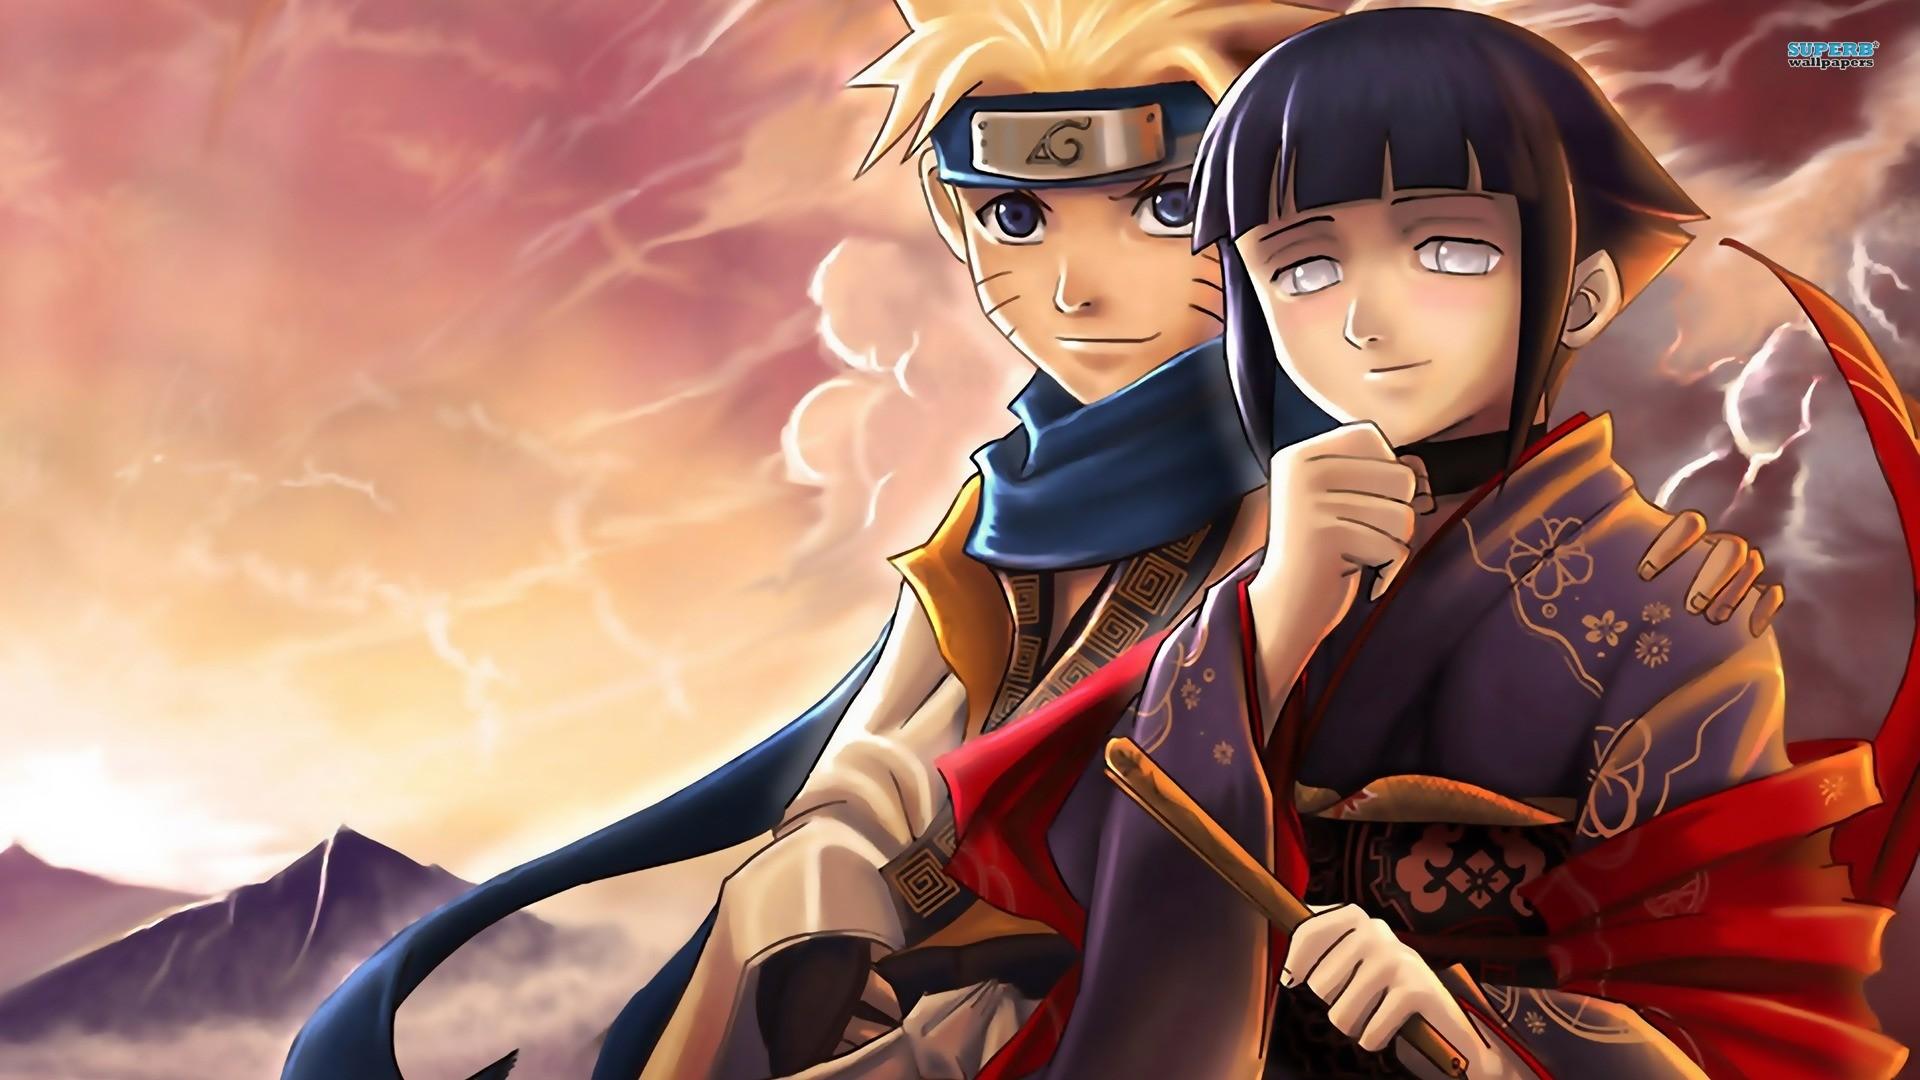 Ideas About Naruto Shippuden Hd On Pinterest Naruto Sad